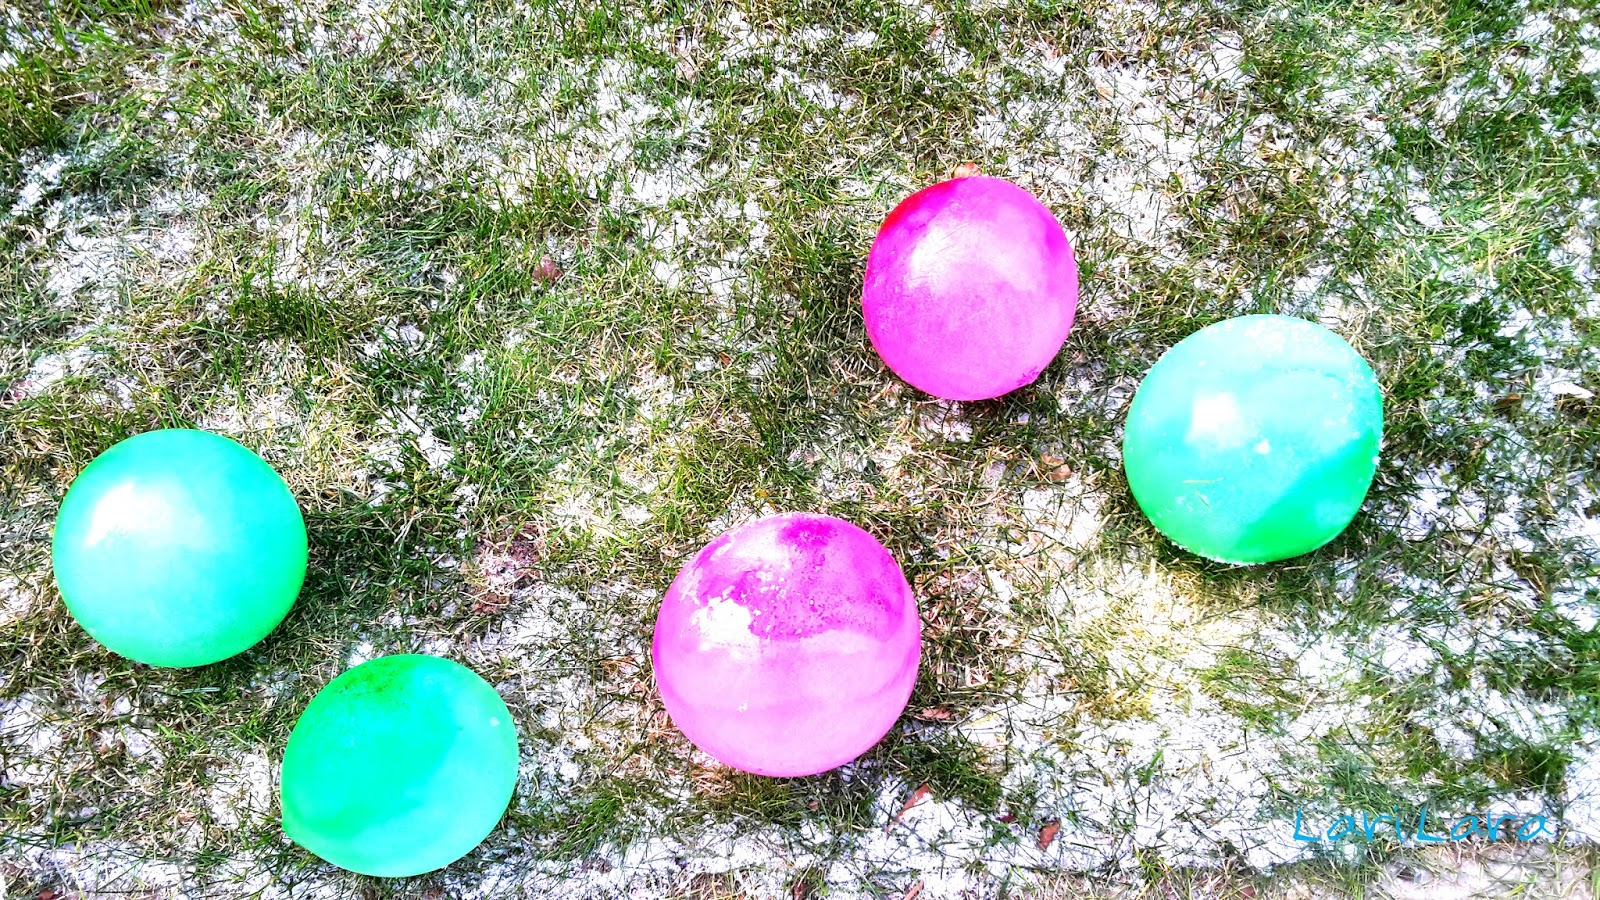 Bei Kälte Eisballons machen